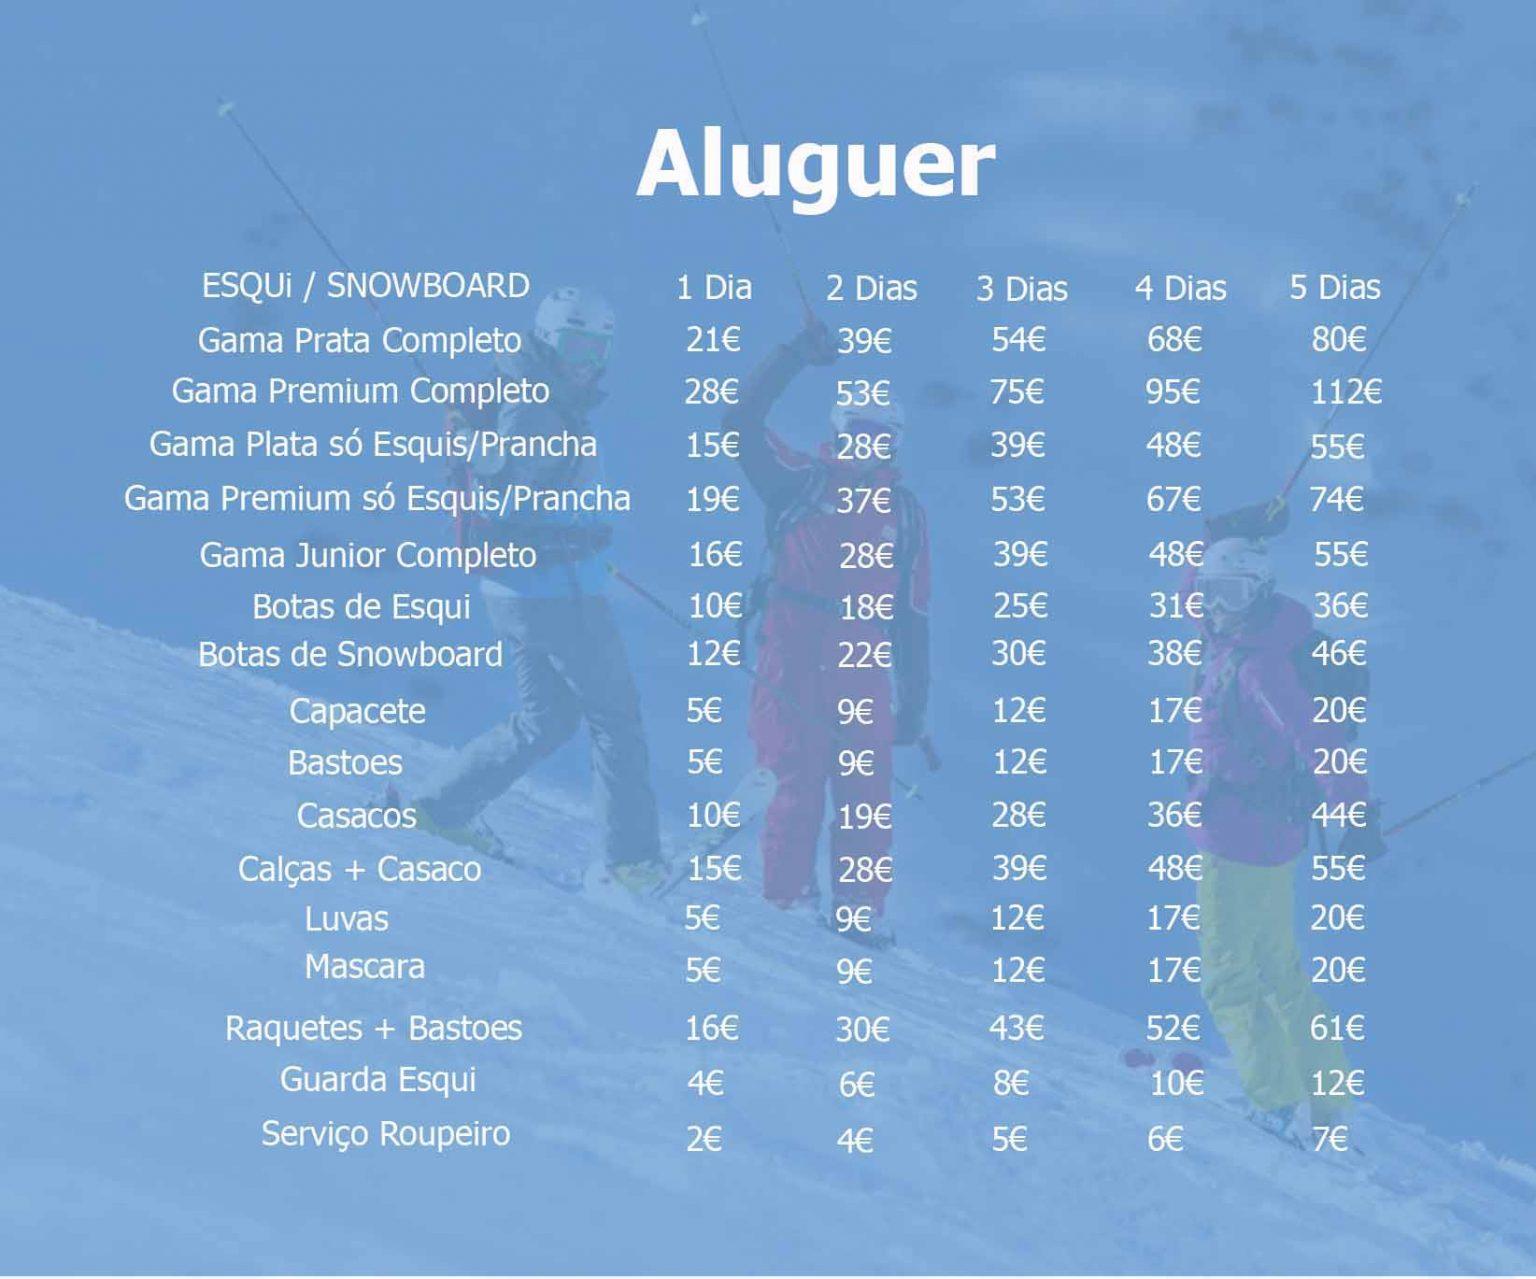 aluguer de ski Serra Nevada